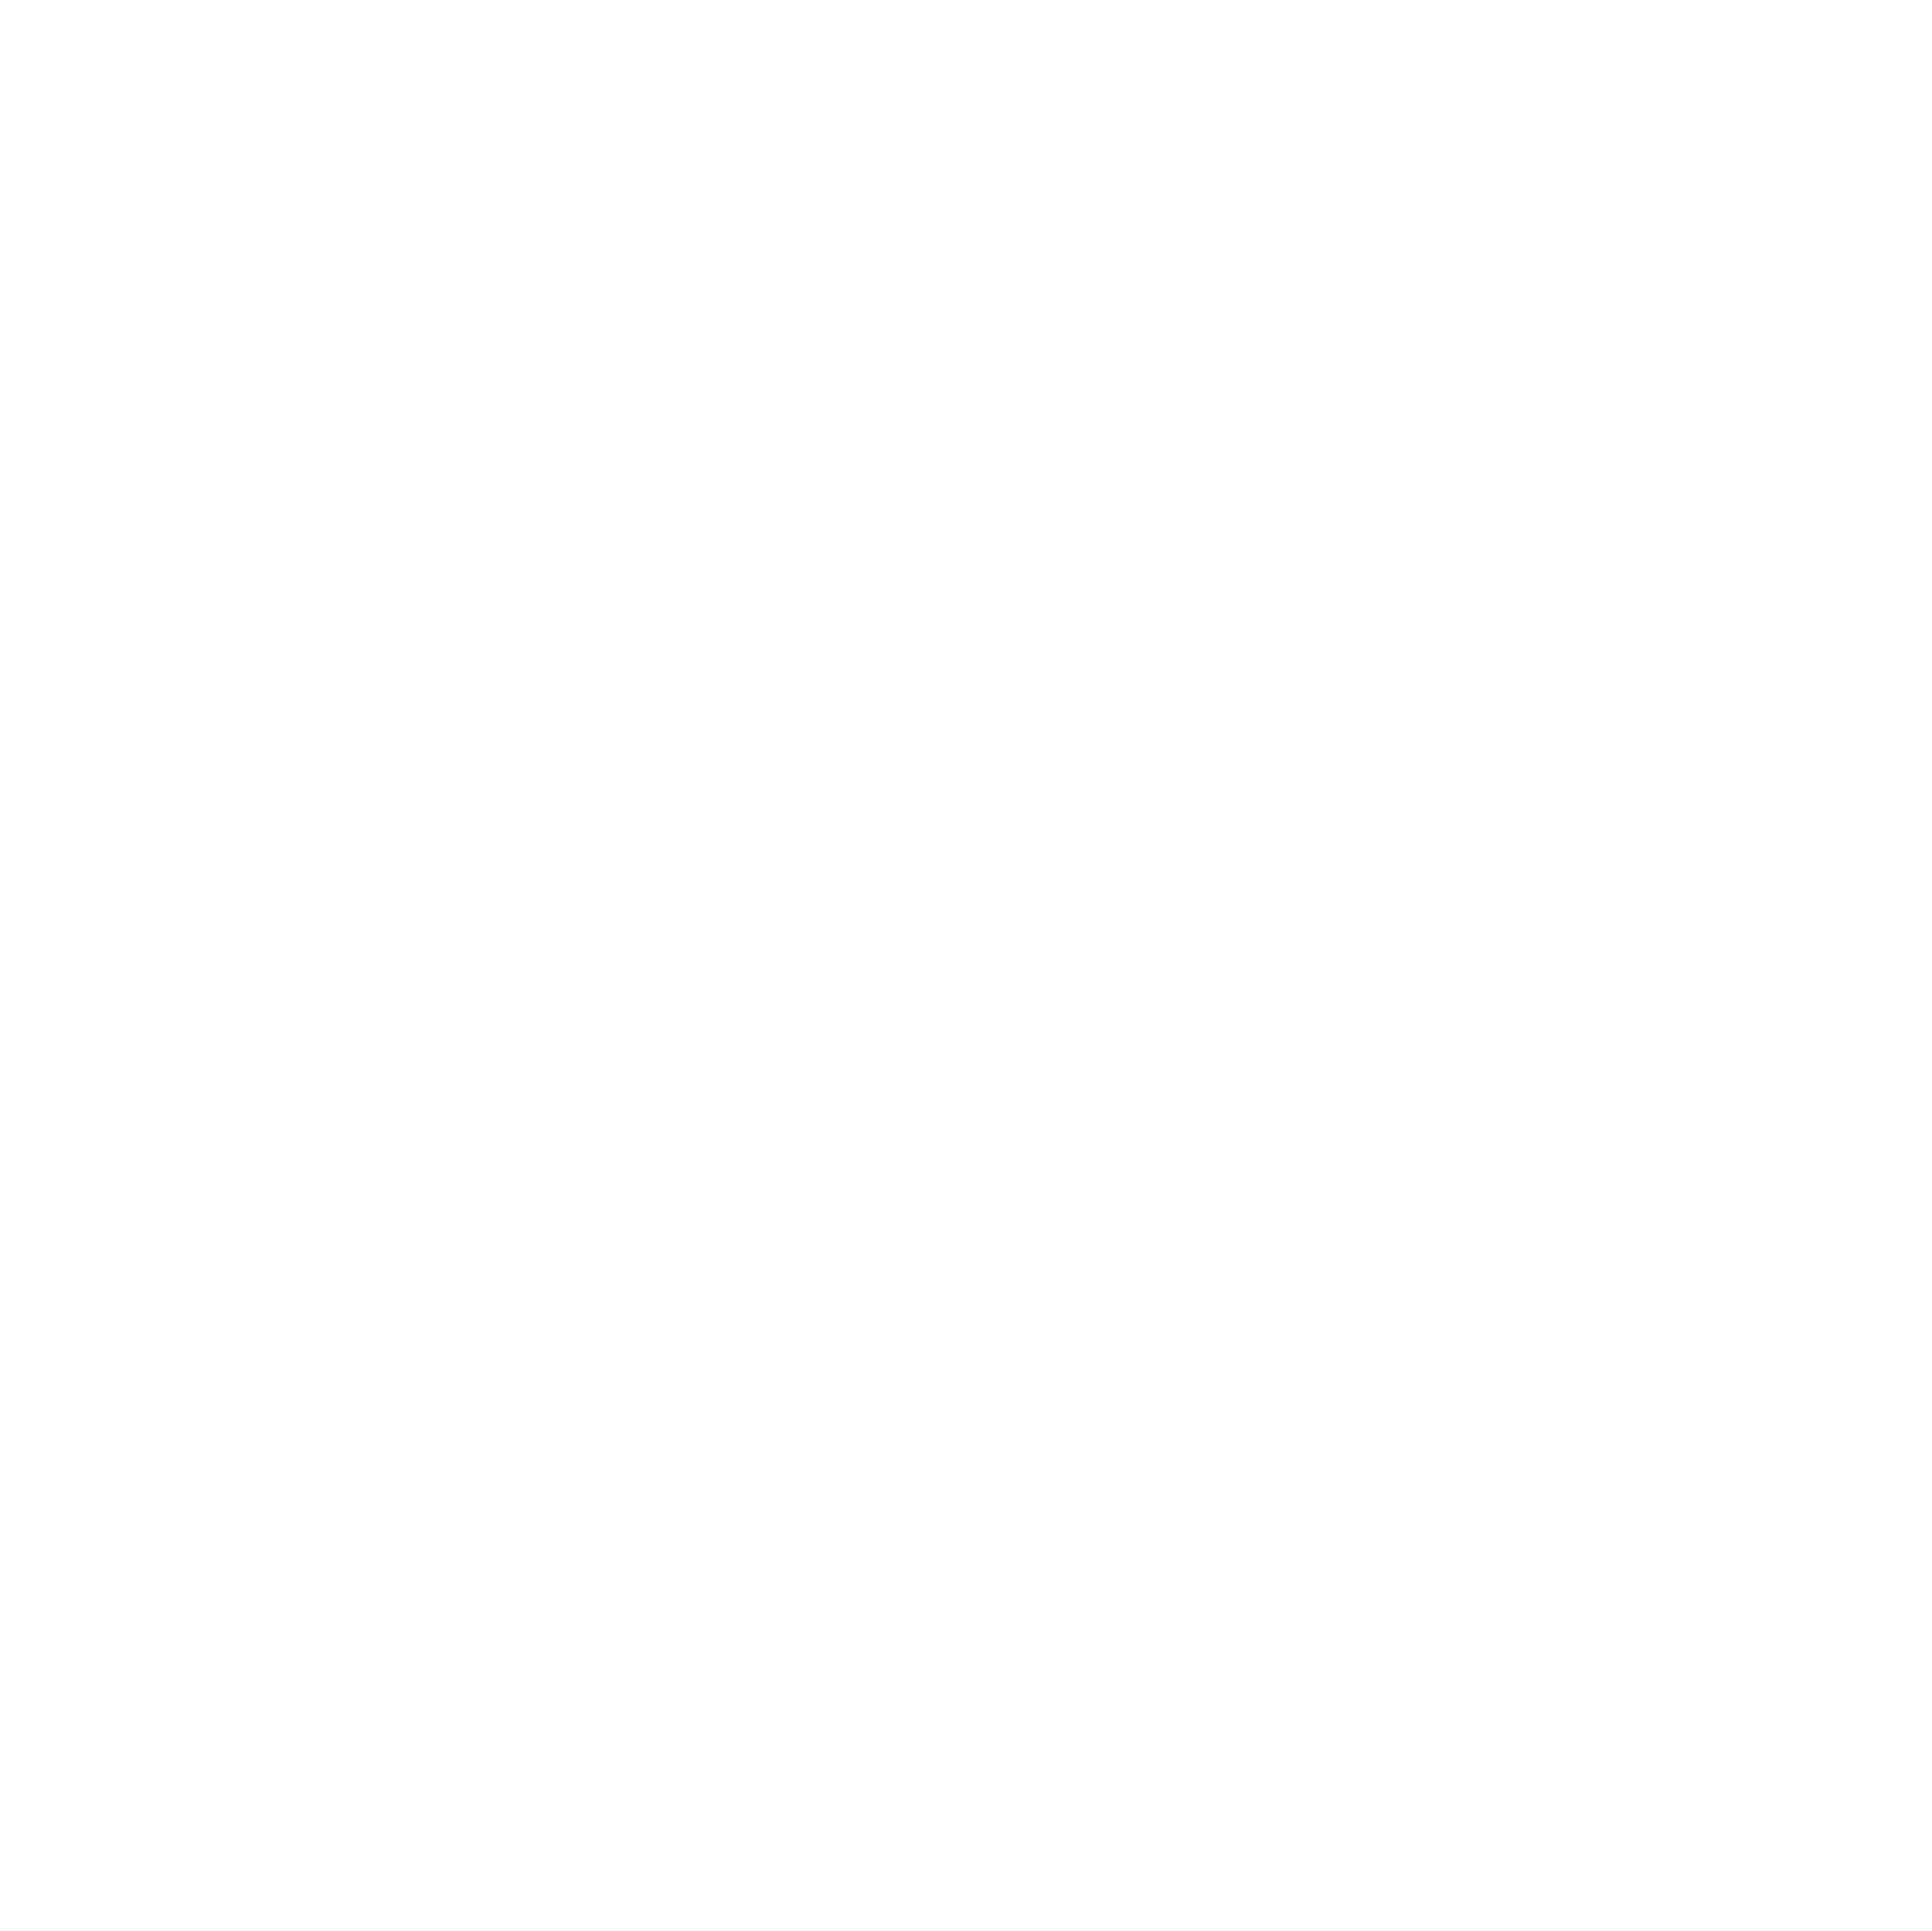 Nirvana - Brand Elements 130619-02.png